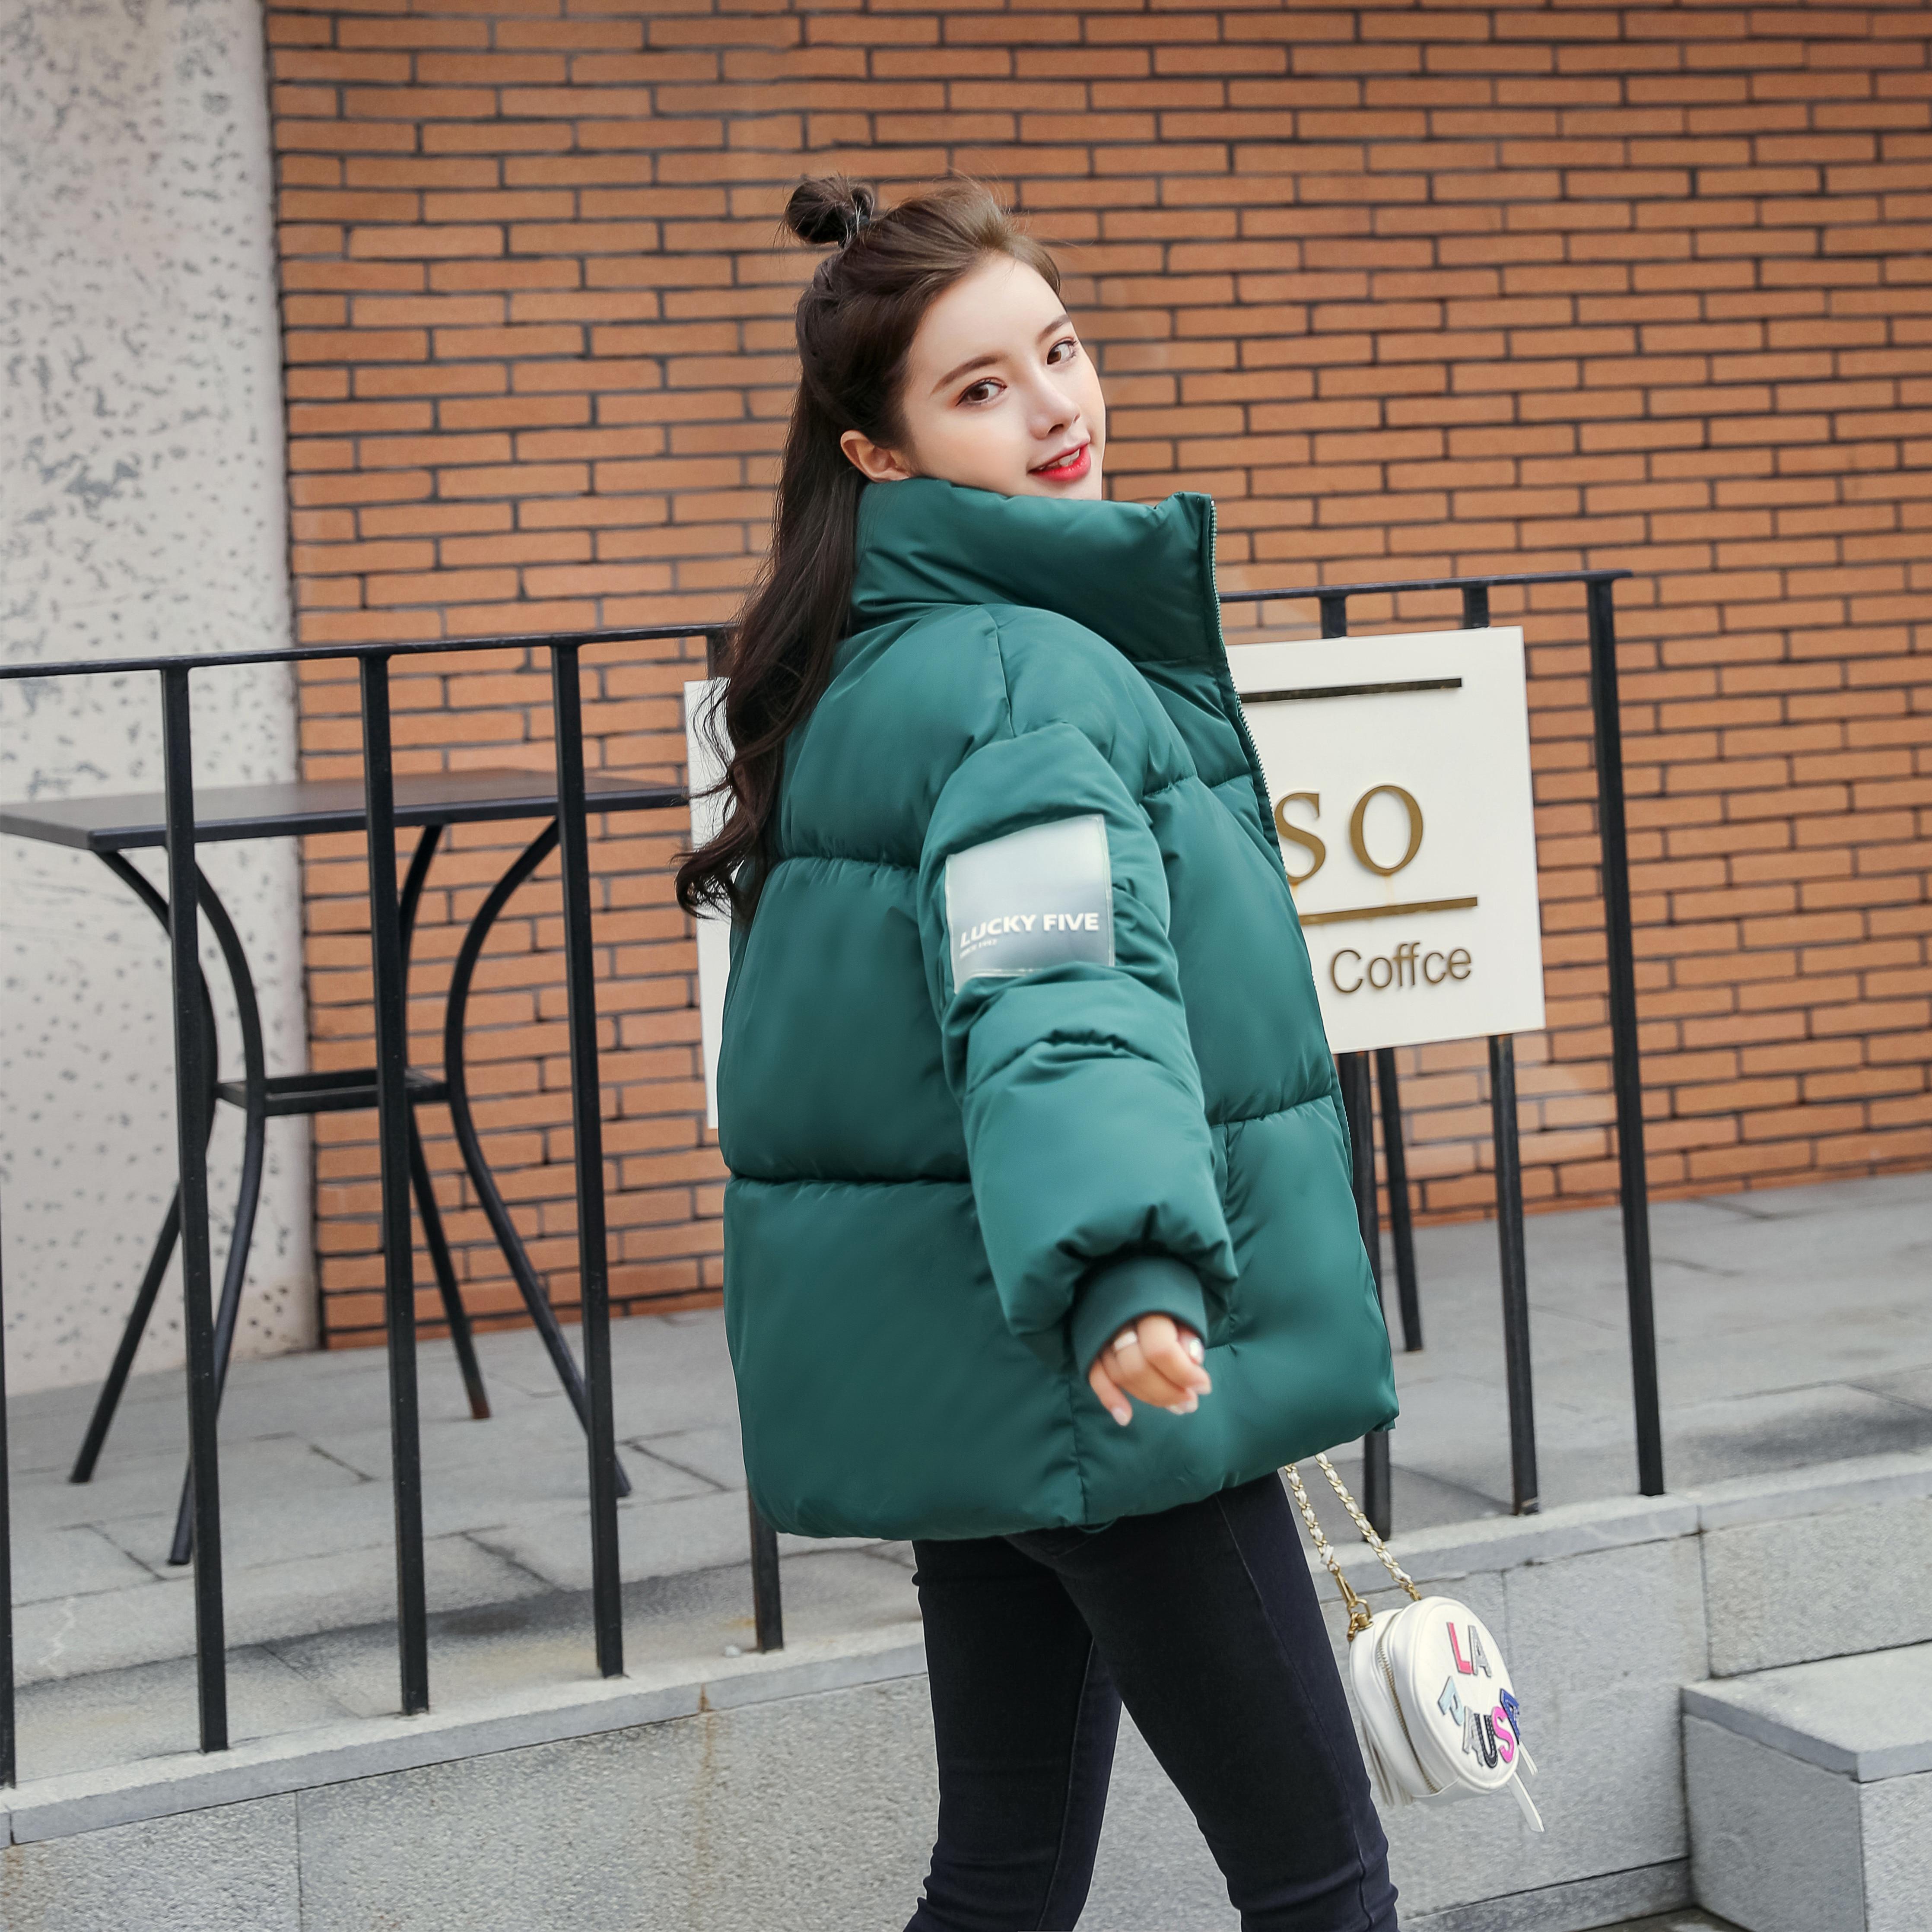 Abrigos Mujer Invierno 2019 Short Winter Jacket Women Cotton Padded Autumn Jacket Female Green Parka  Coat Womens  Puffer Jacket